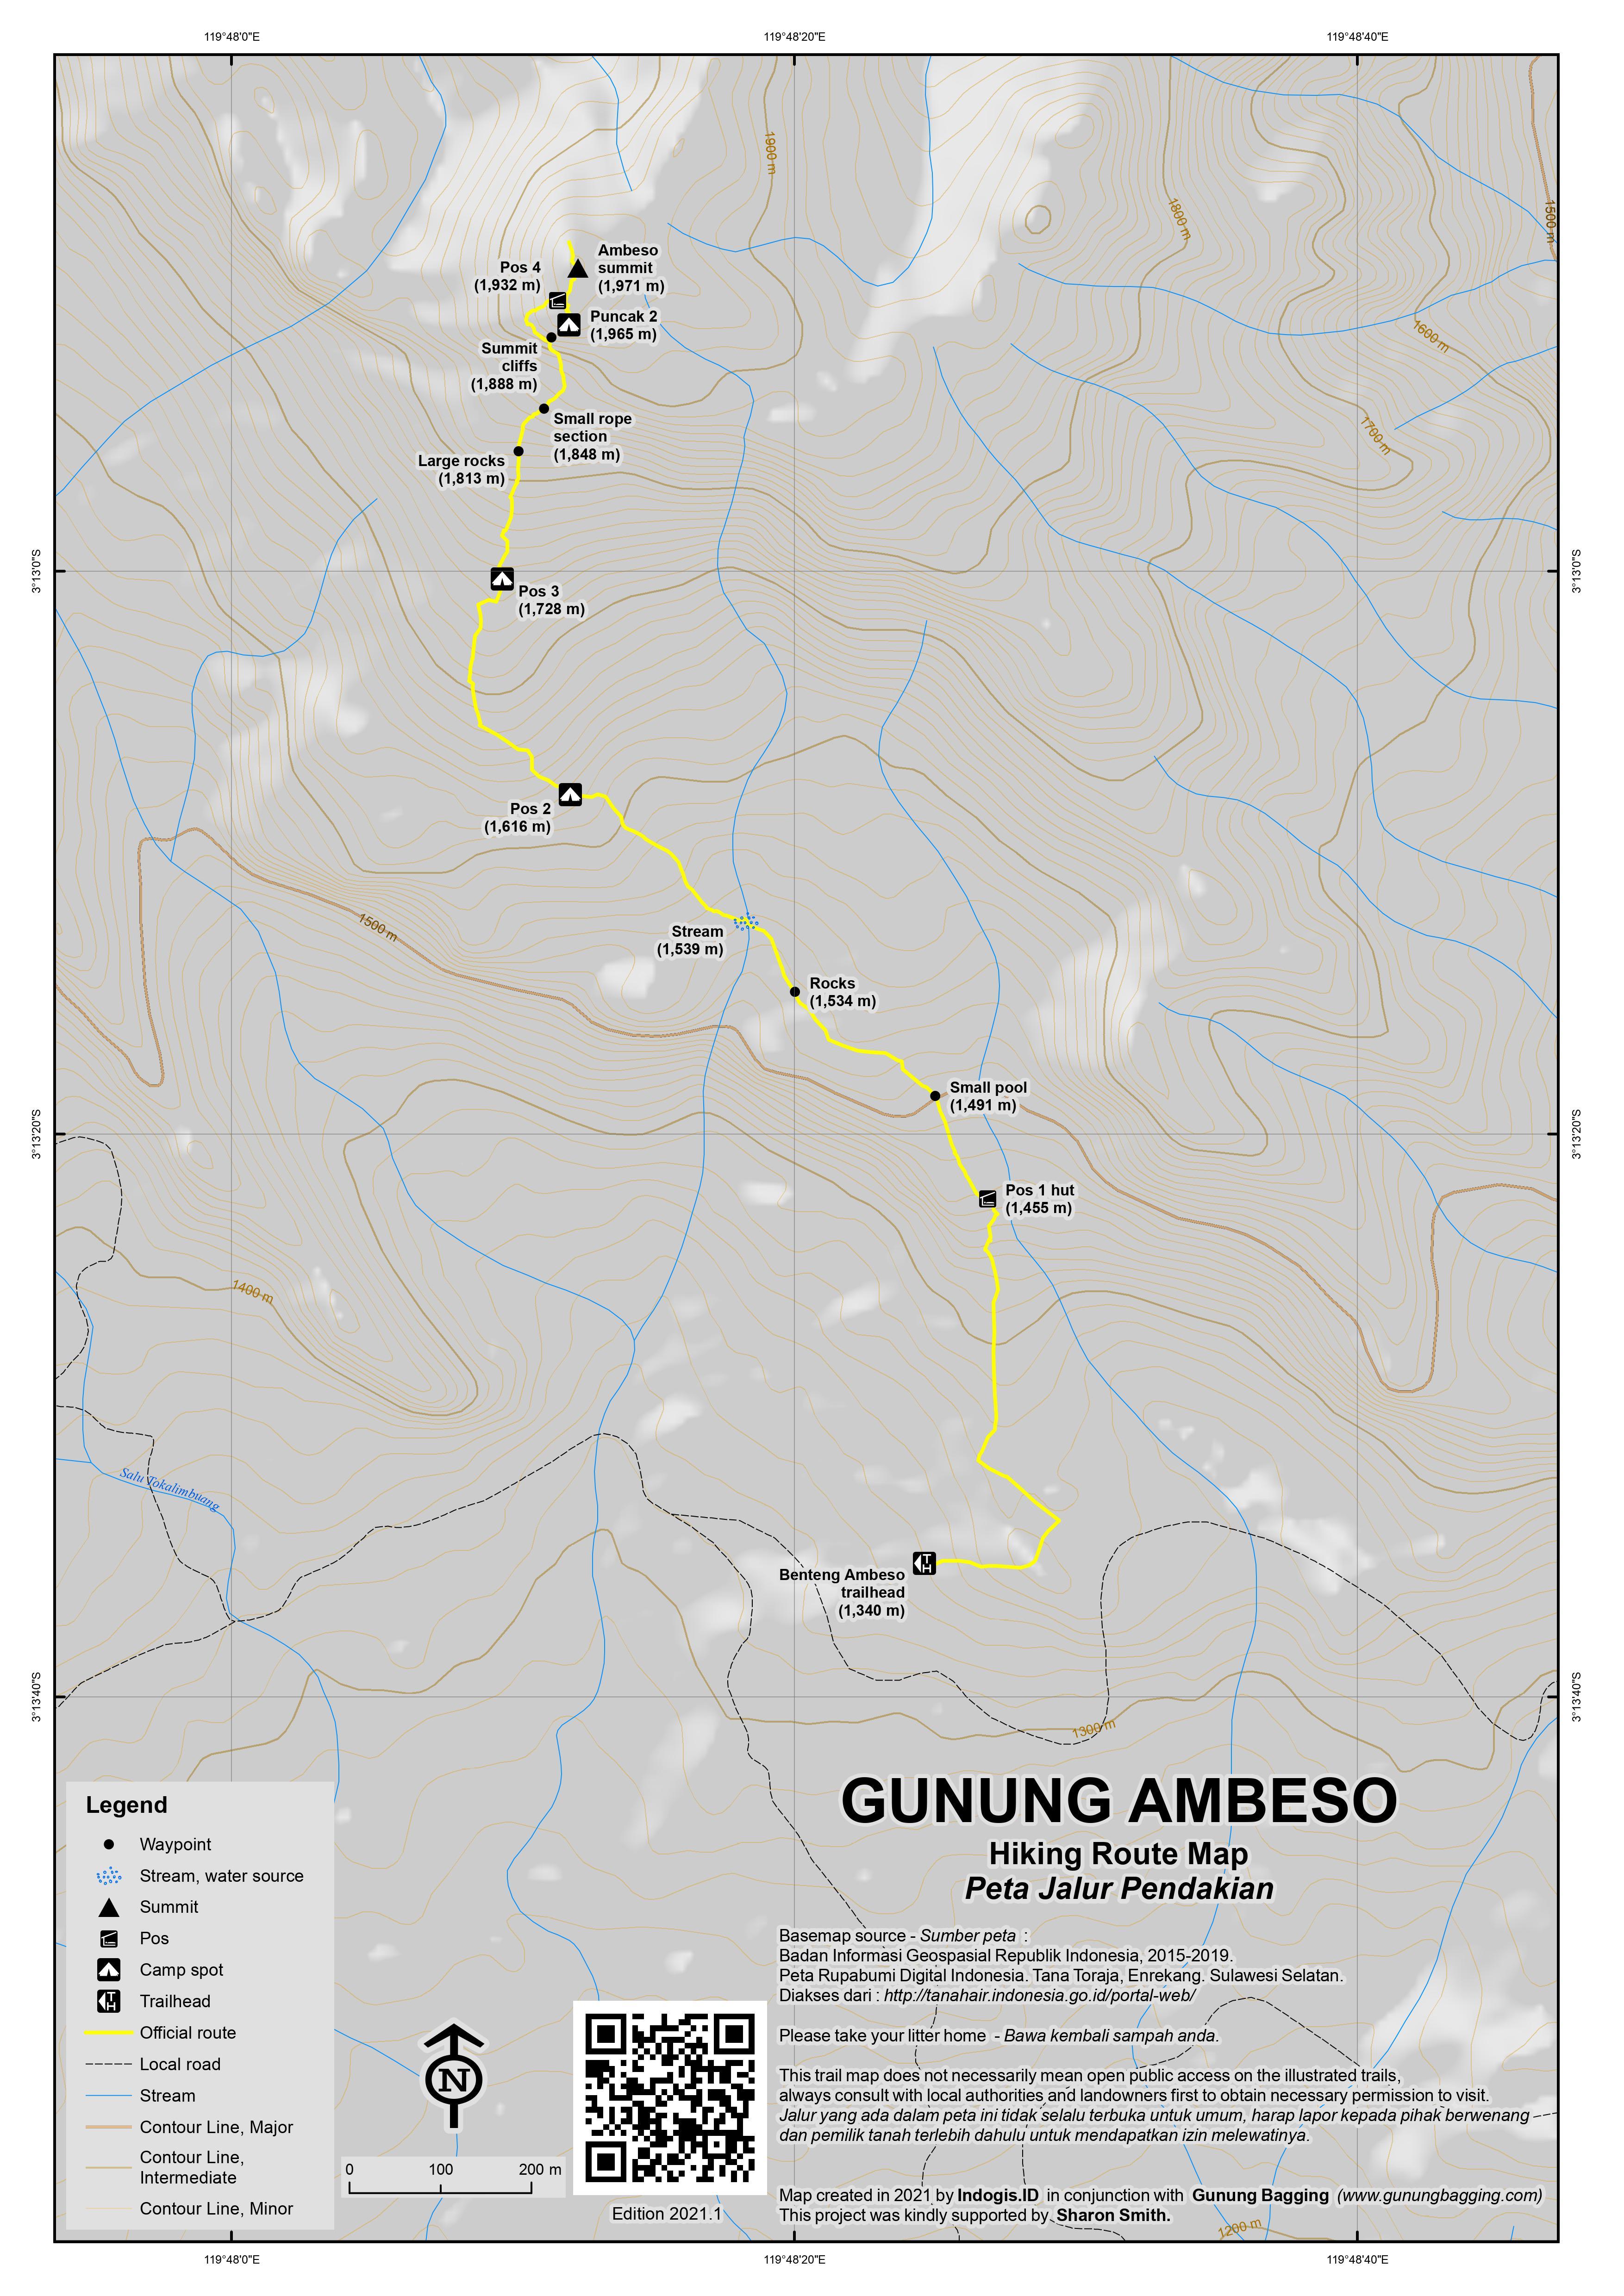 Peta Jalur Pendakian Gunung Ambeso